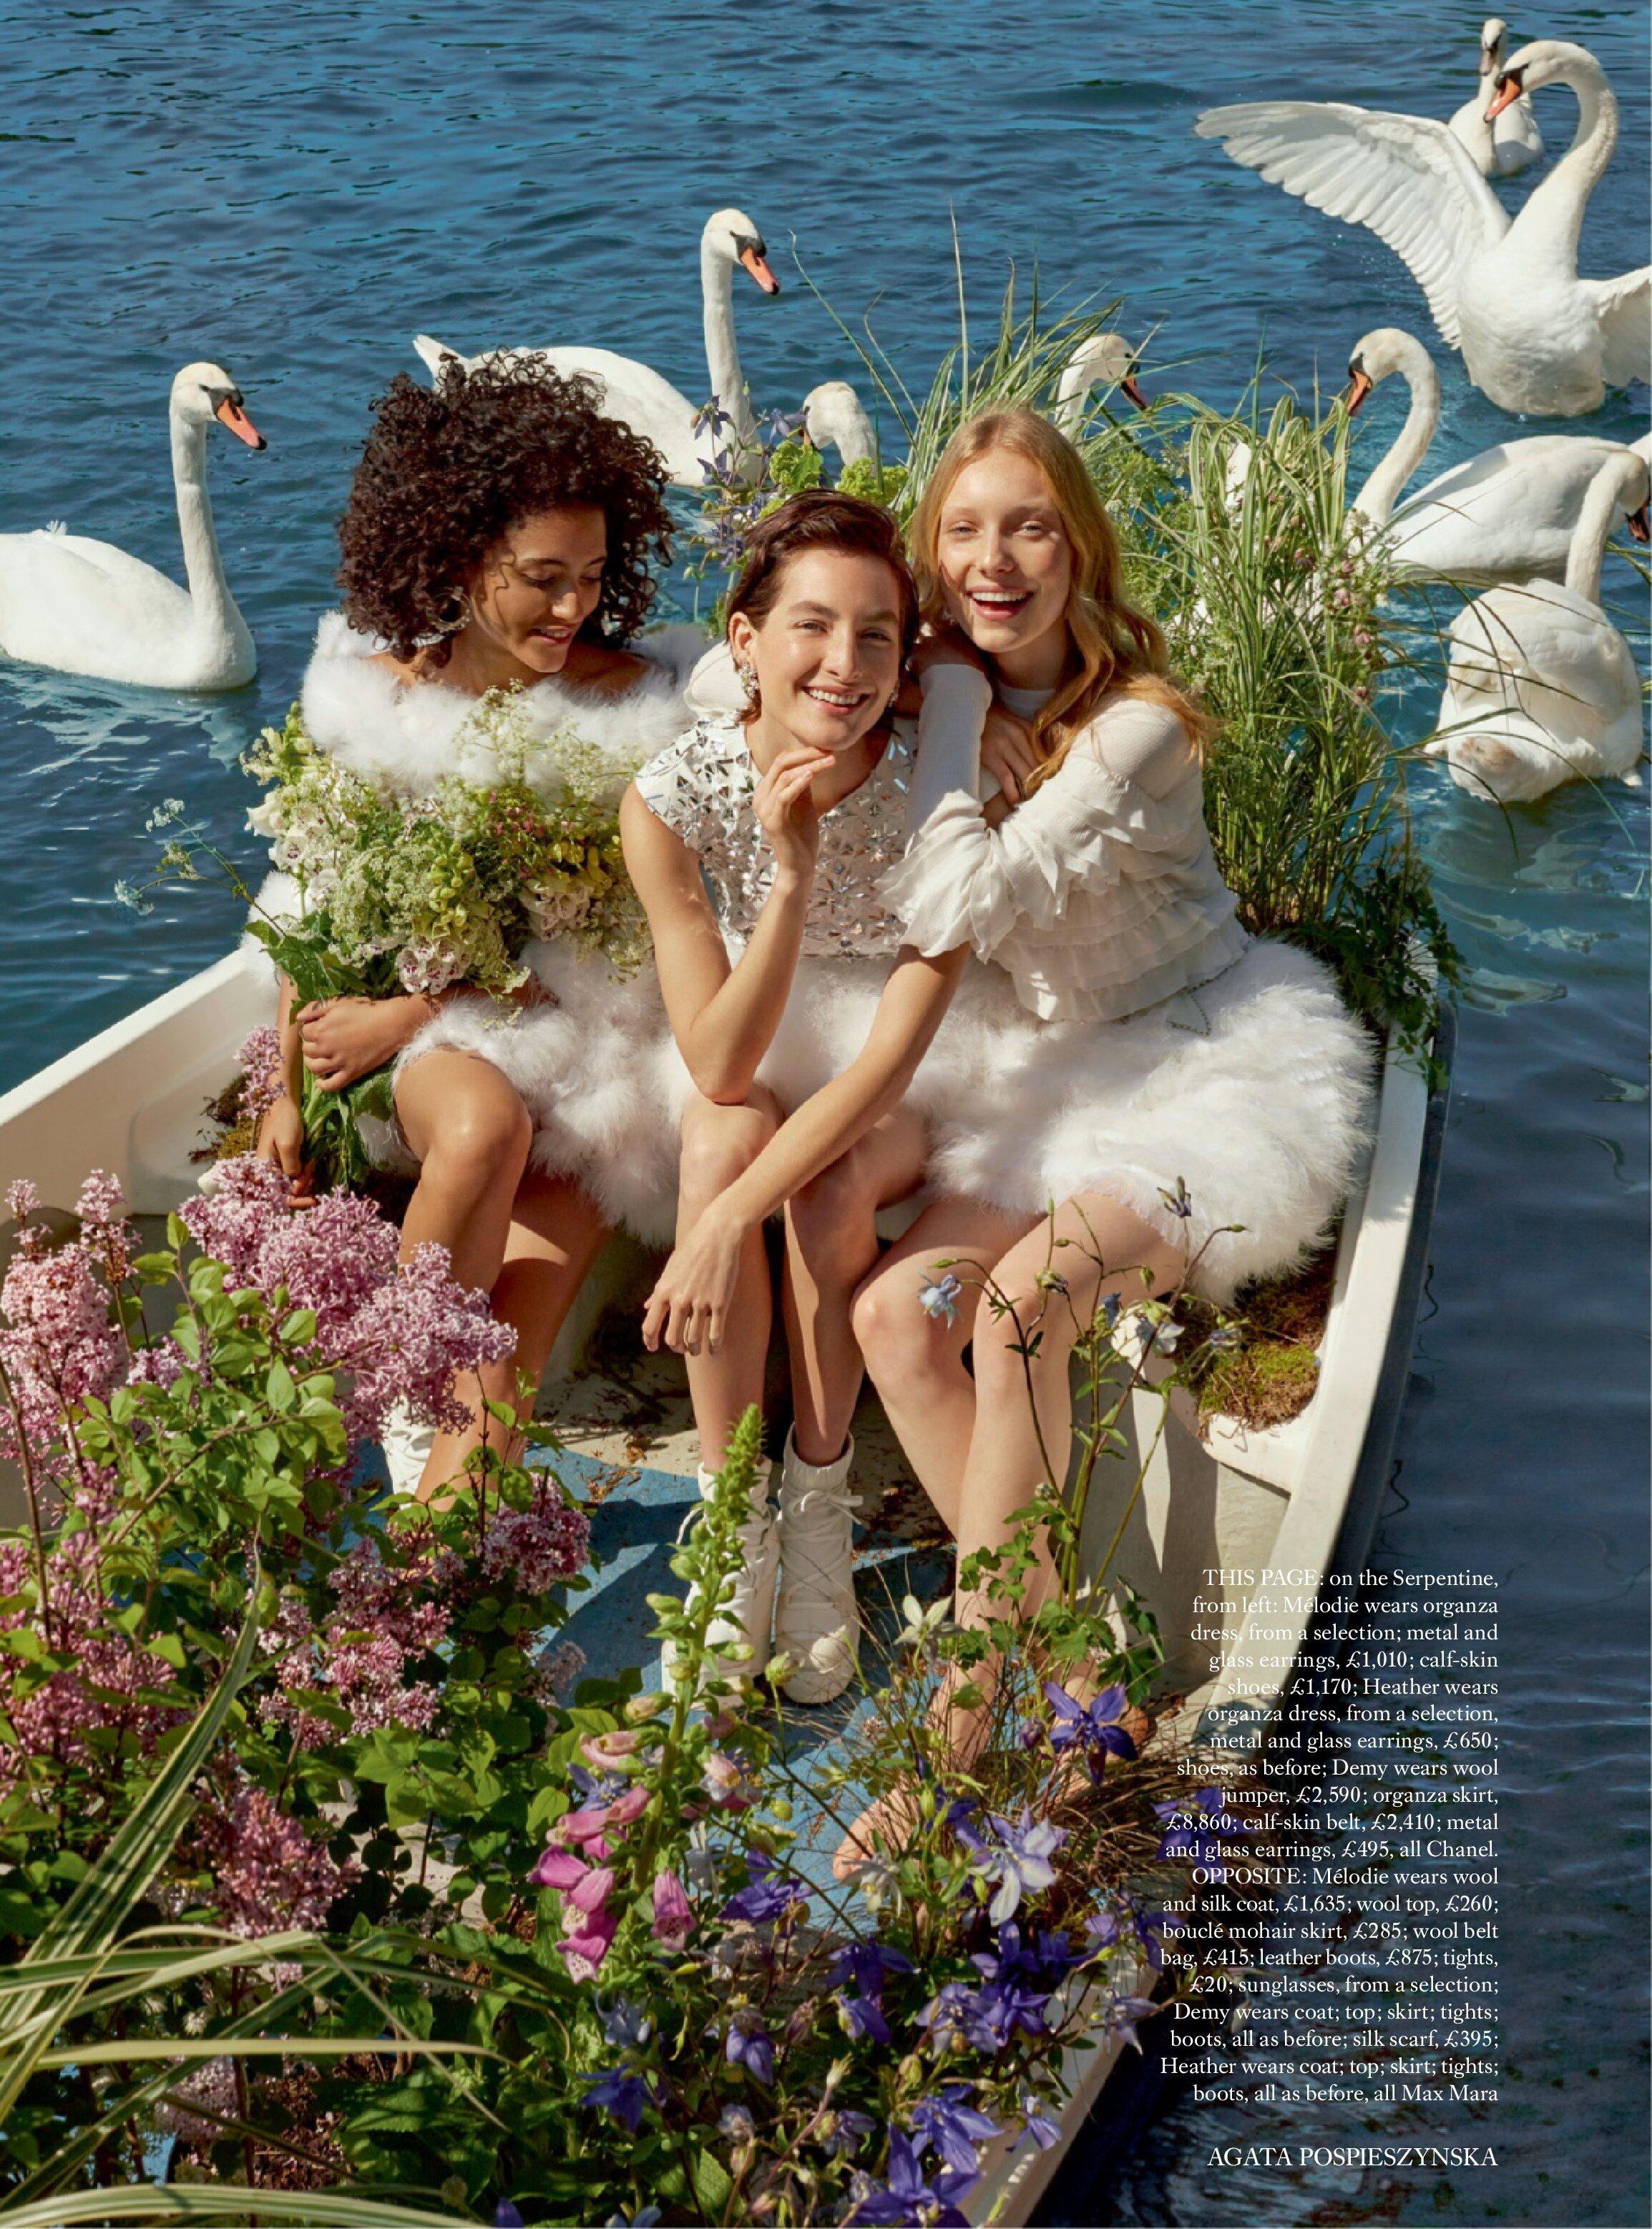 Agata Popieszynska-Girls Are Back in Town Harper's Bazaar UK Aug 2019 (17).jpg